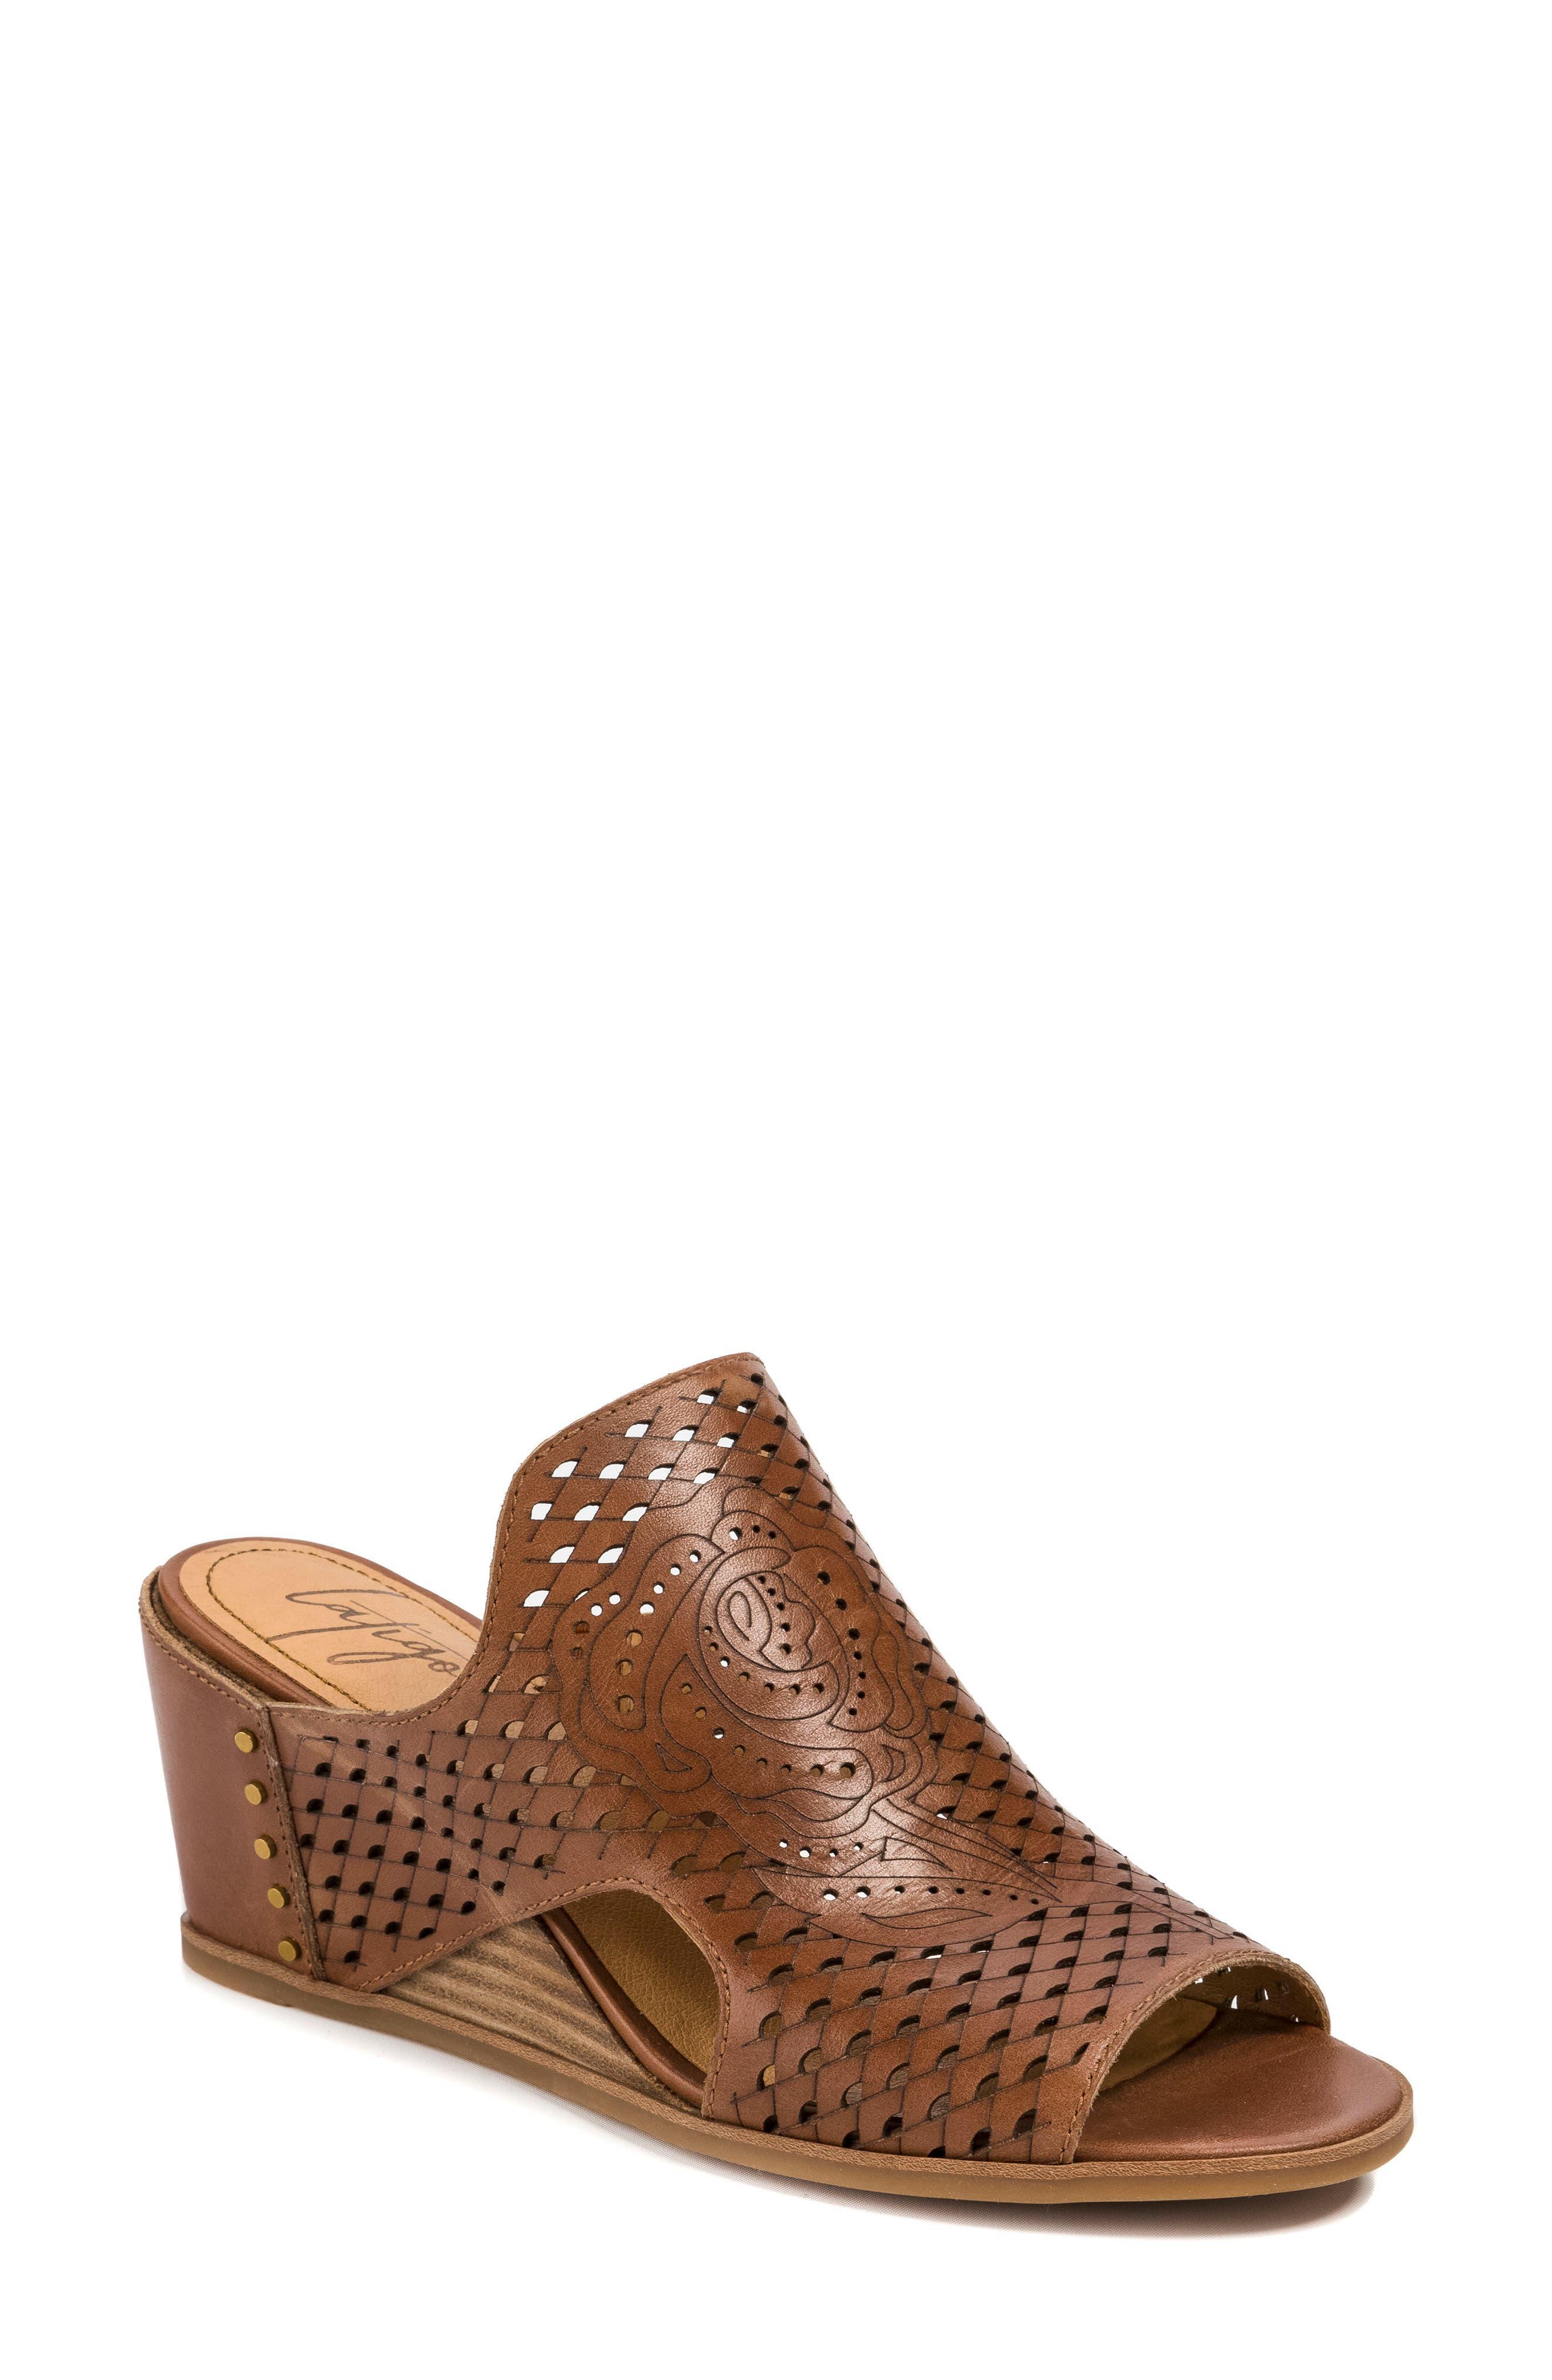 Janis Laser Cut Wedge Sandal,                             Main thumbnail 1, color,                             Brush Brown Leather